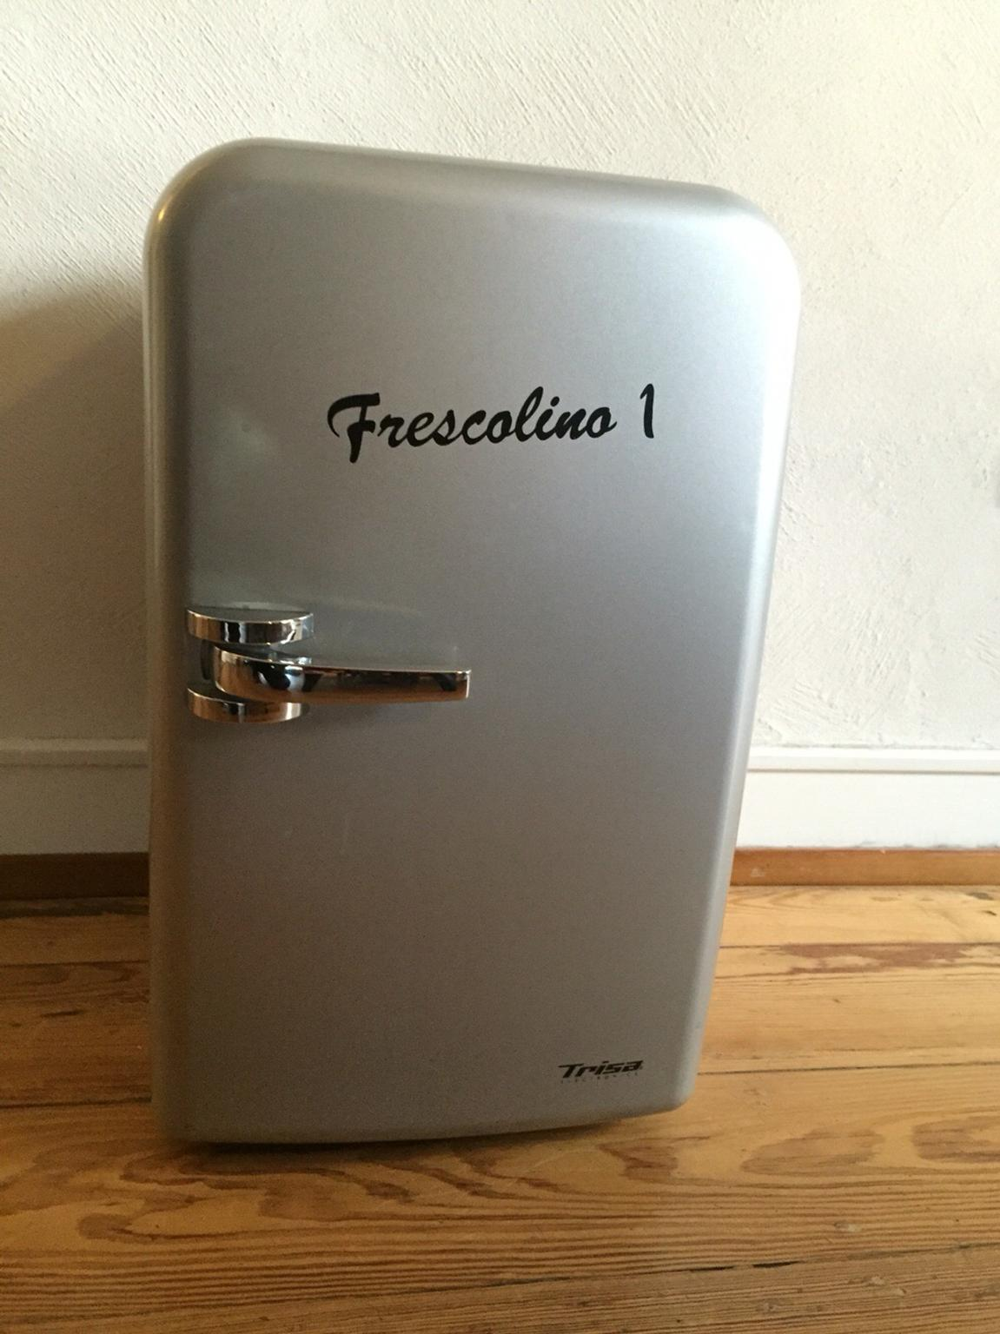 Mini Kühlschrank 17 Liter : Die besten in mini kühlschränke top bestseller in mini